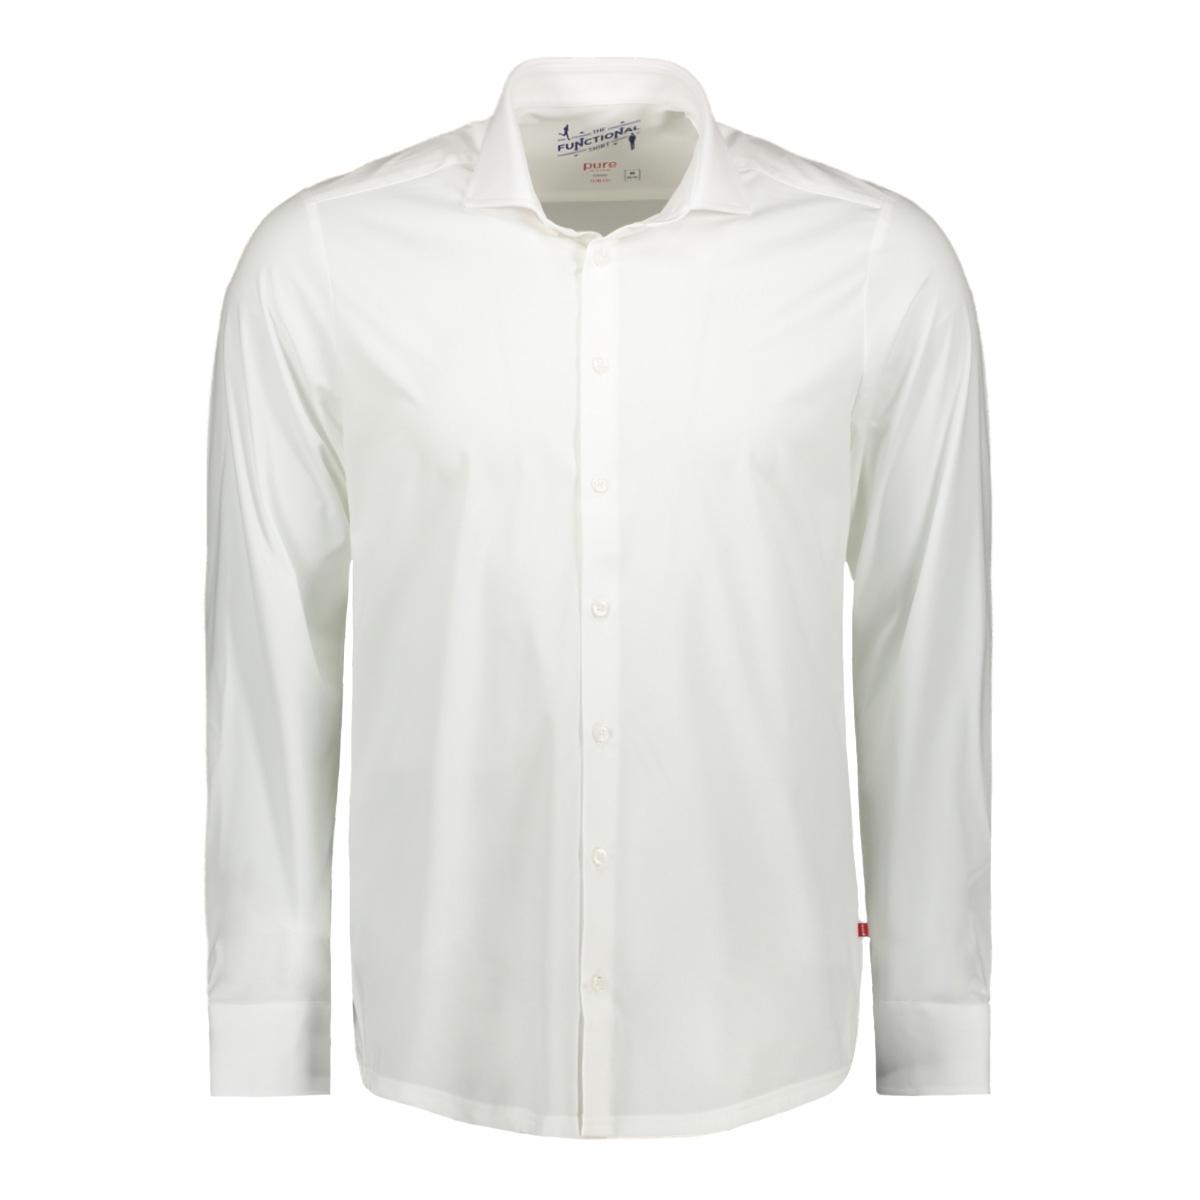 functional shirt slim 3385 21109 pure h. tico overhemd white